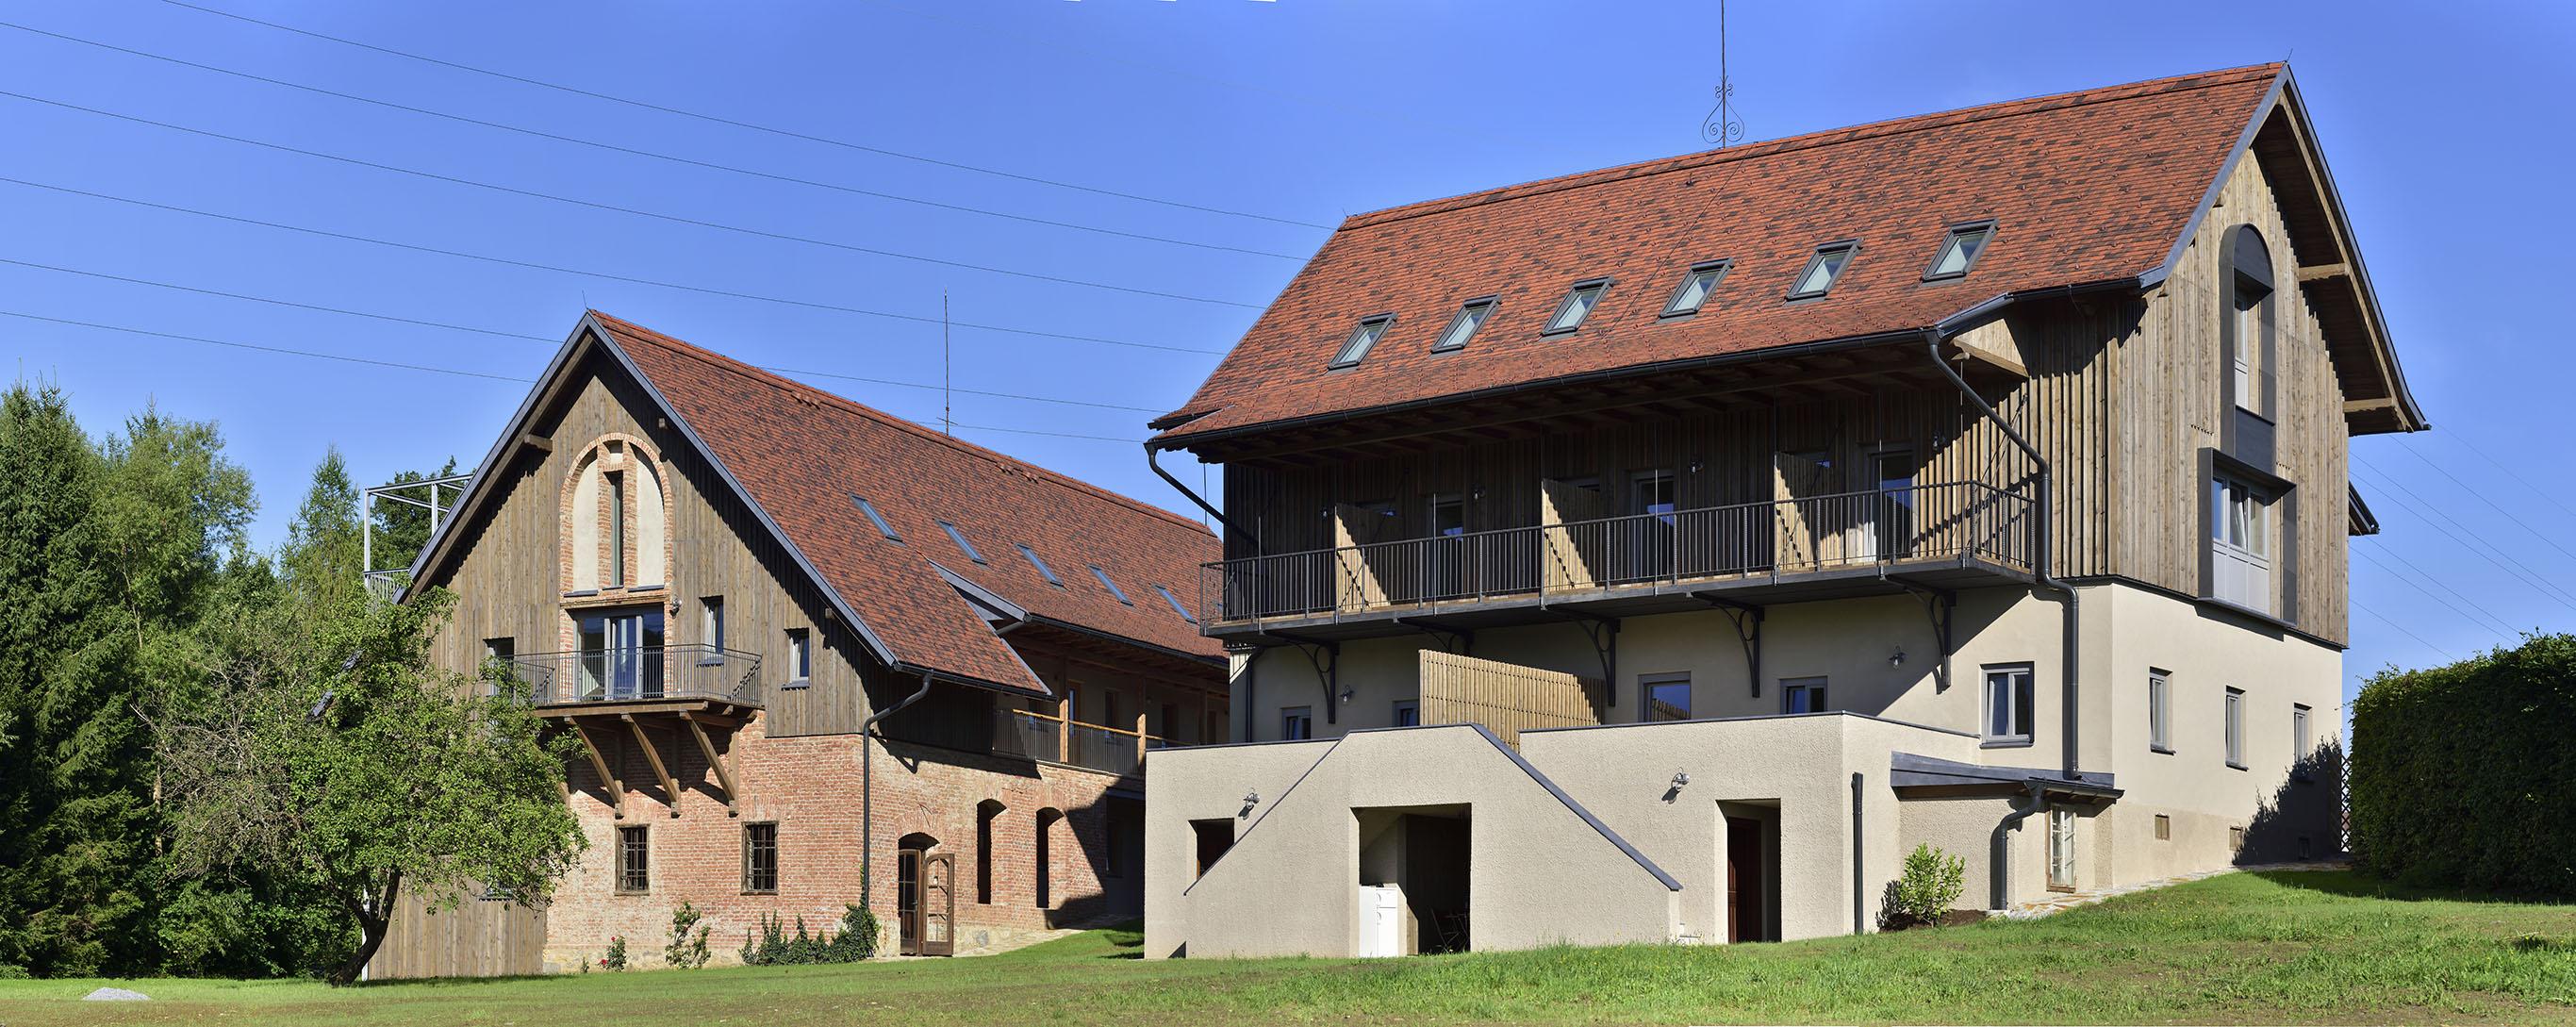 Moarhof-31.7.16